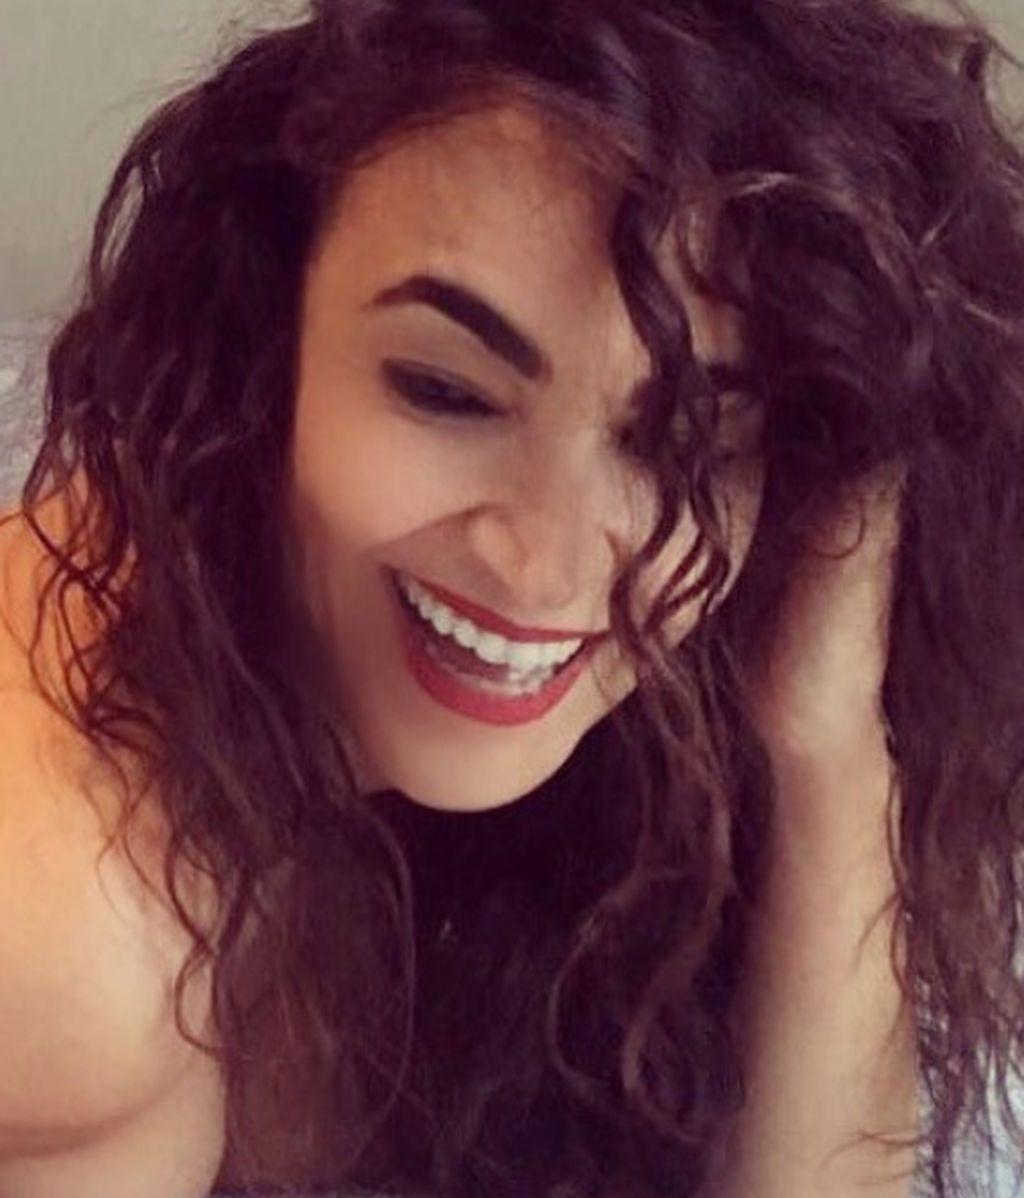 Cristina Rodríguez 'Cámbiame' sorprende en Instagram con un desnudo integral